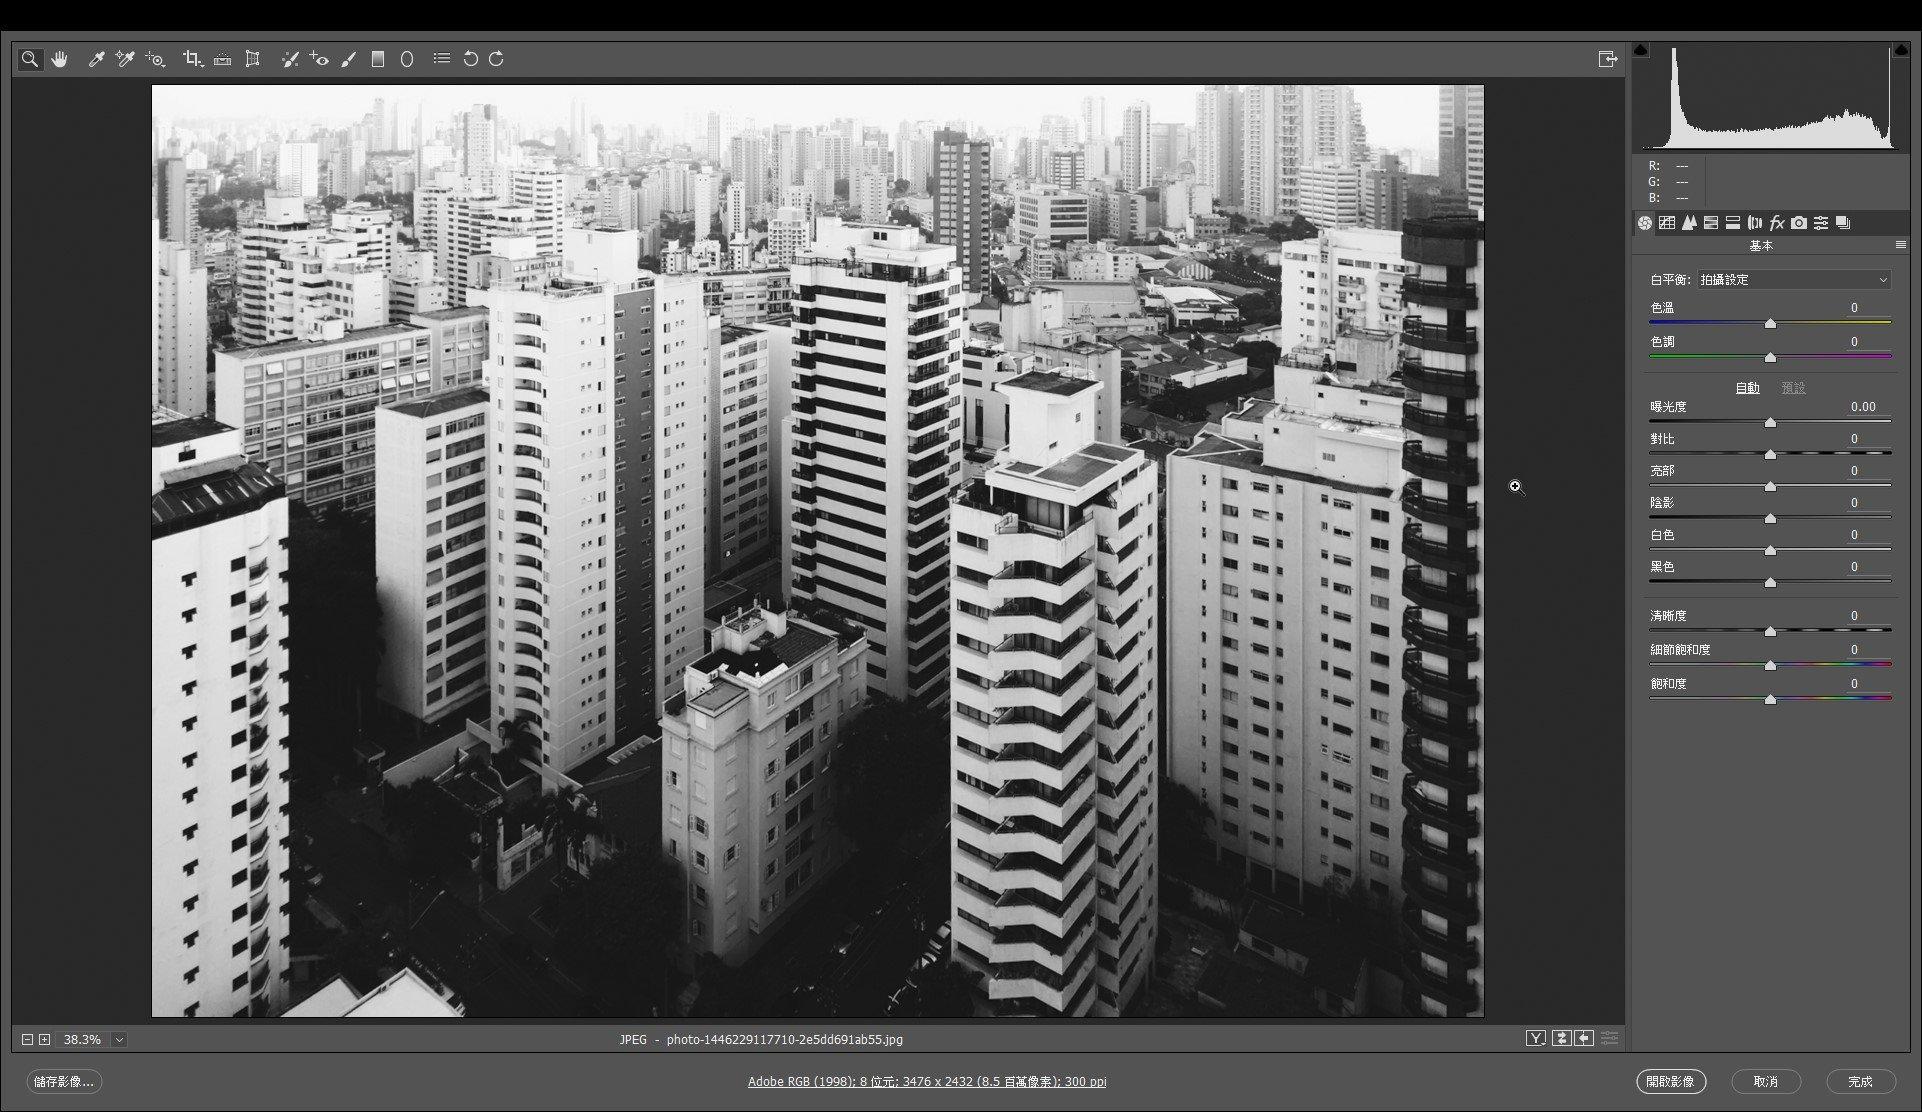 photoshop-deformation-correction 06